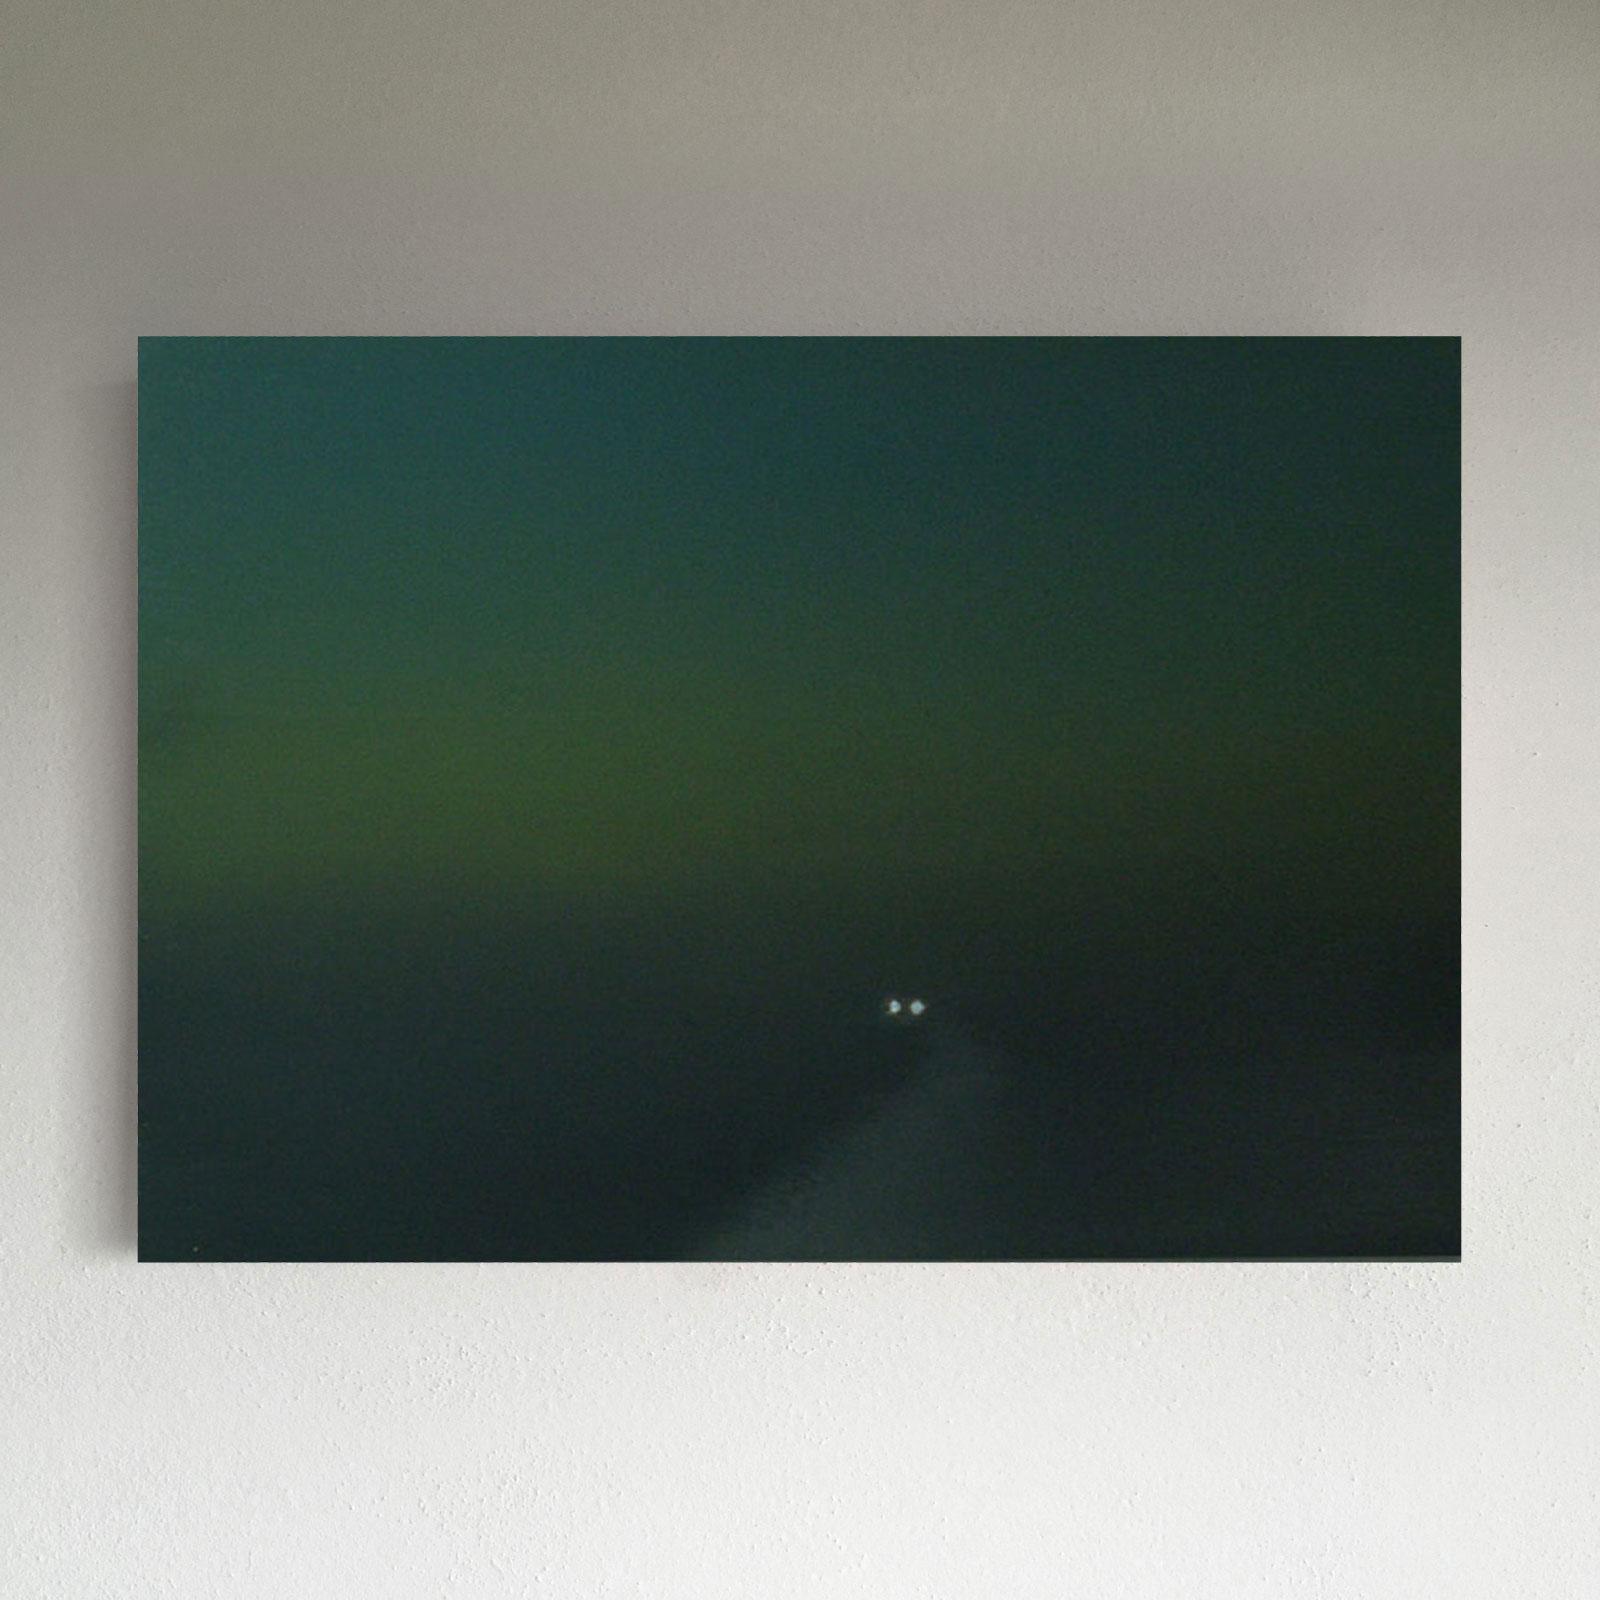 T#12-2008, oil on canvas, 70x100cm, priv. coll.